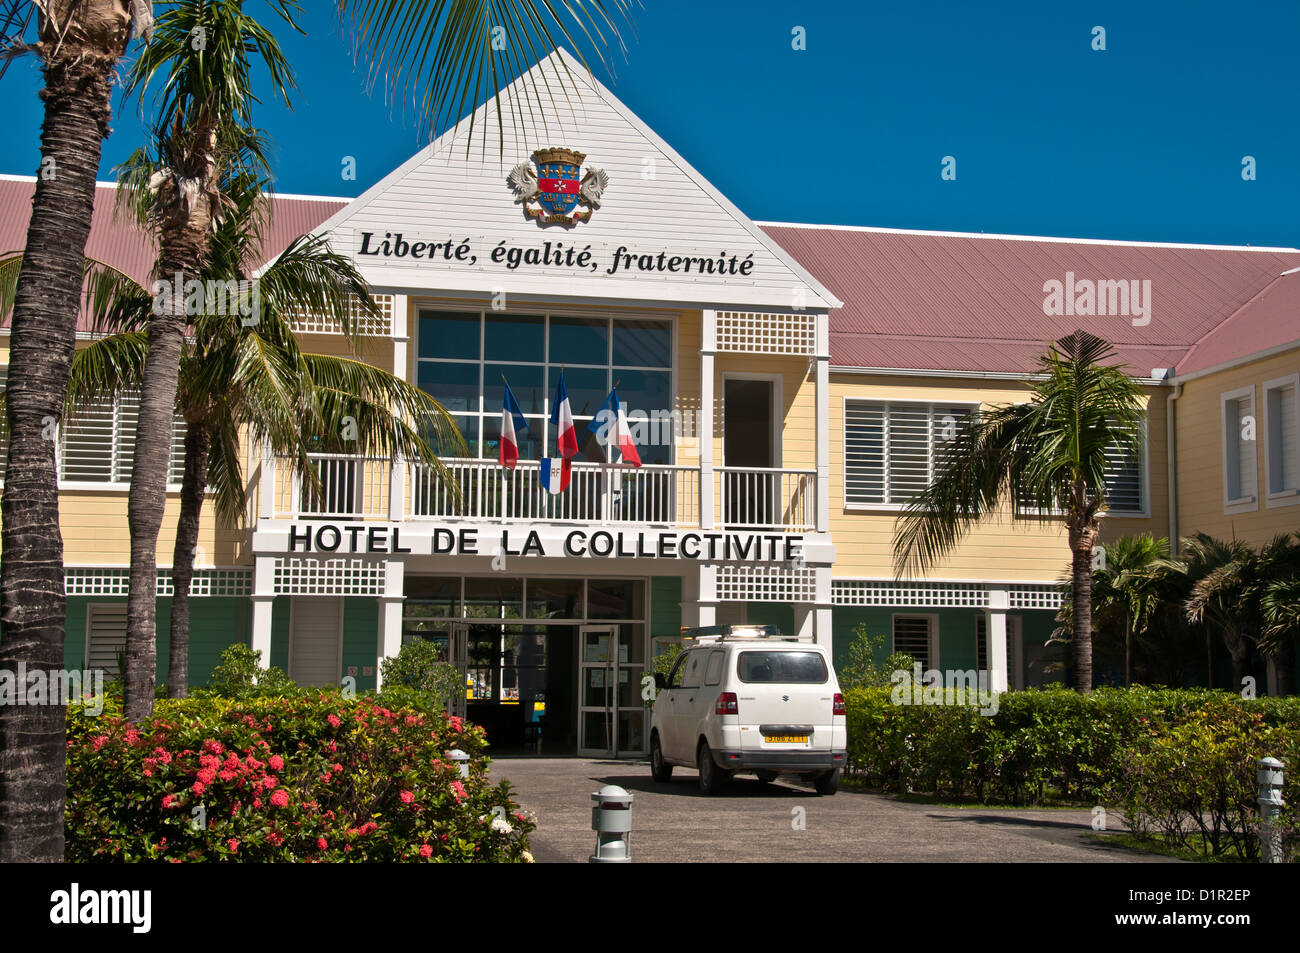 Exterior entrance Hotel Collective de la Collectivite, Gustavia, Saint-Barthelemy - Stock Image